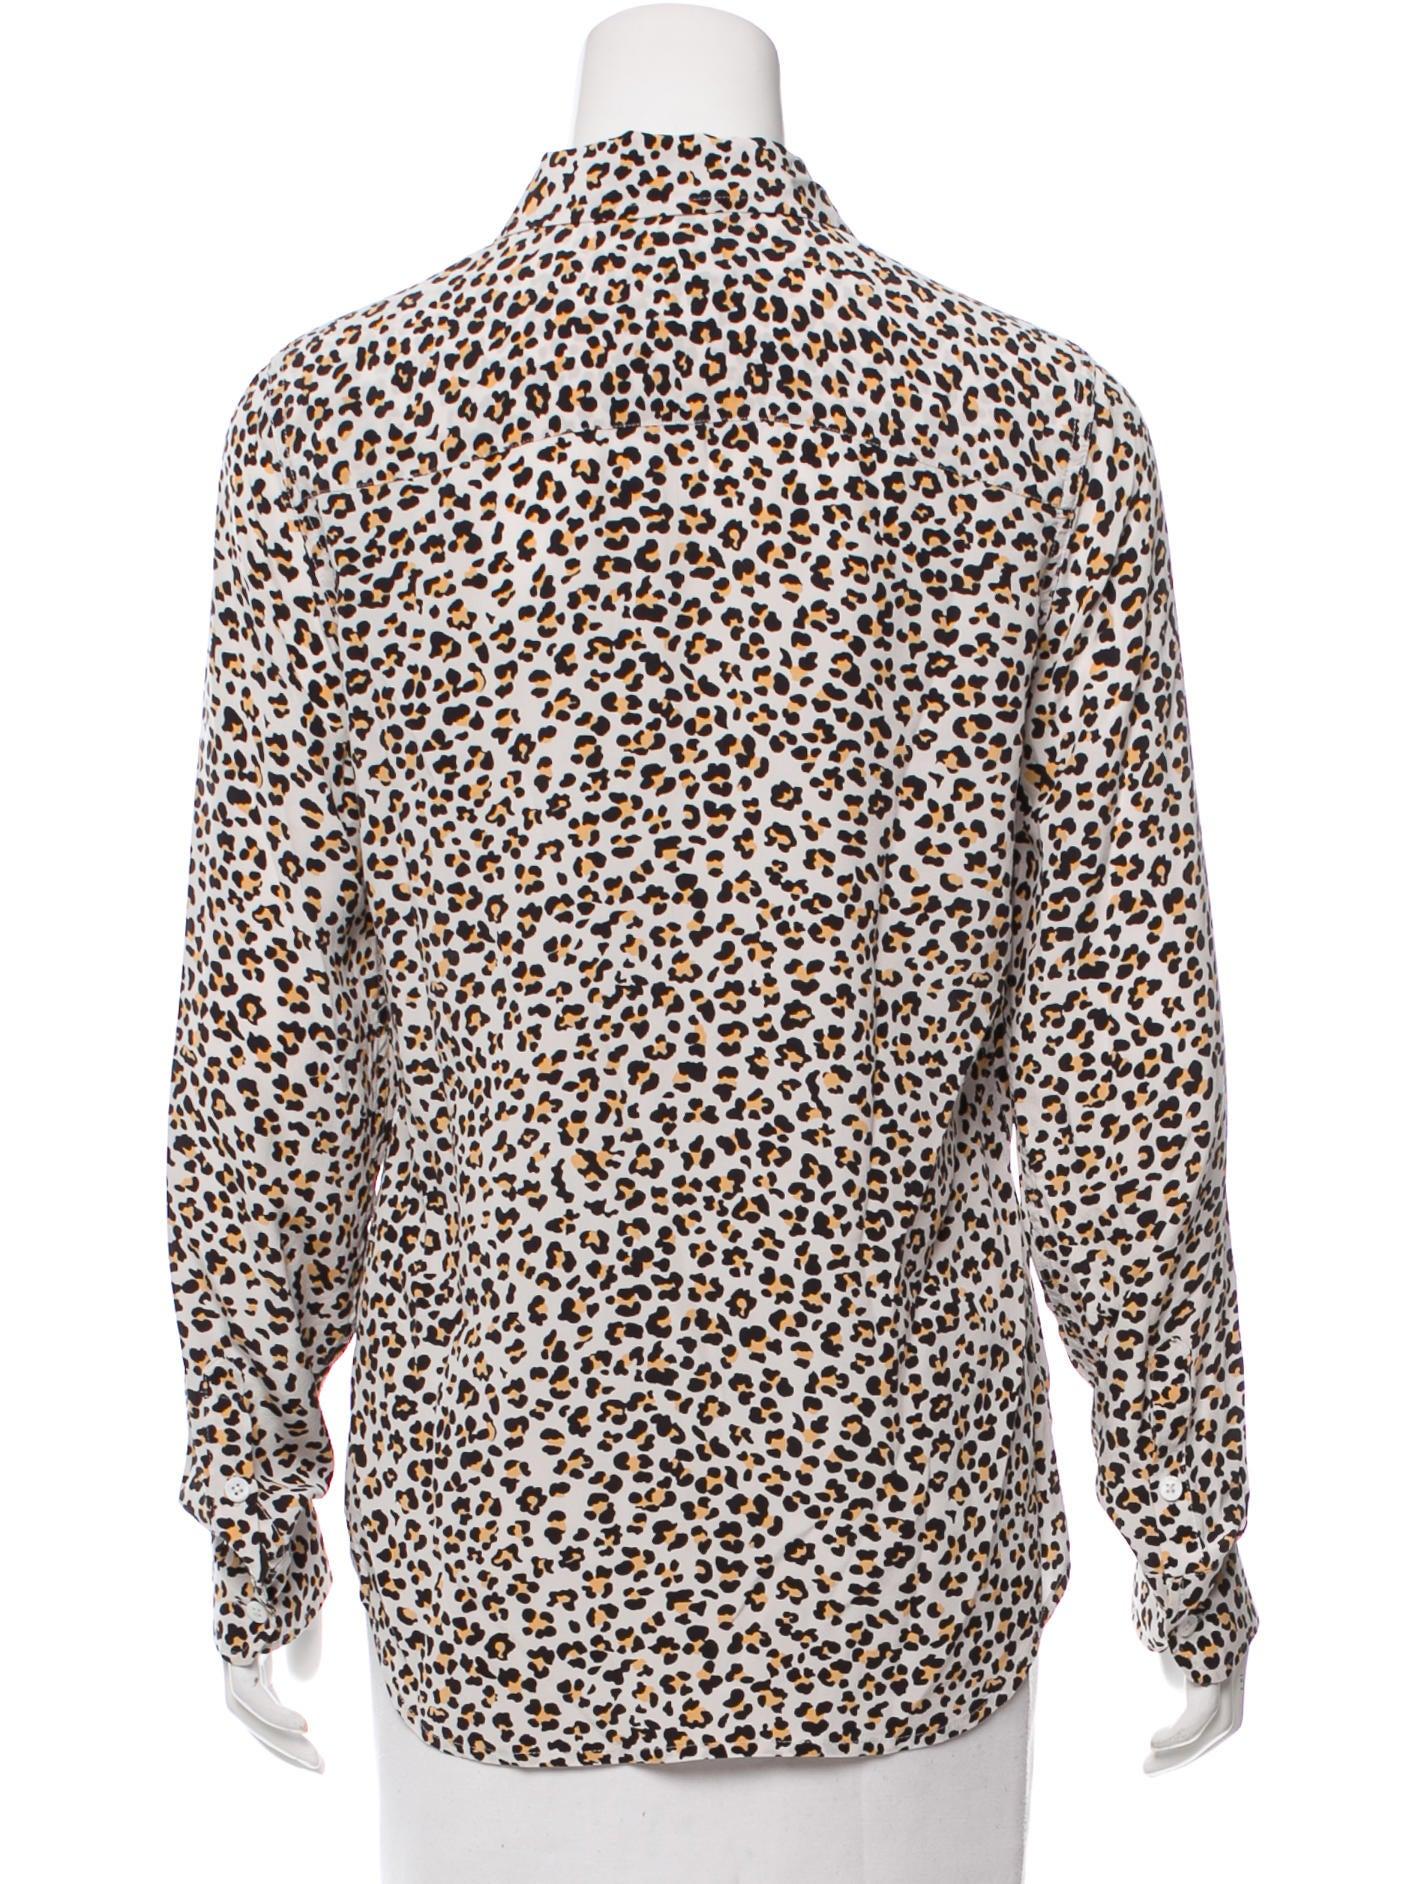 b74d5fe0b07959 Equipment Leopard Print Silk Shirt - BCD Tofu House